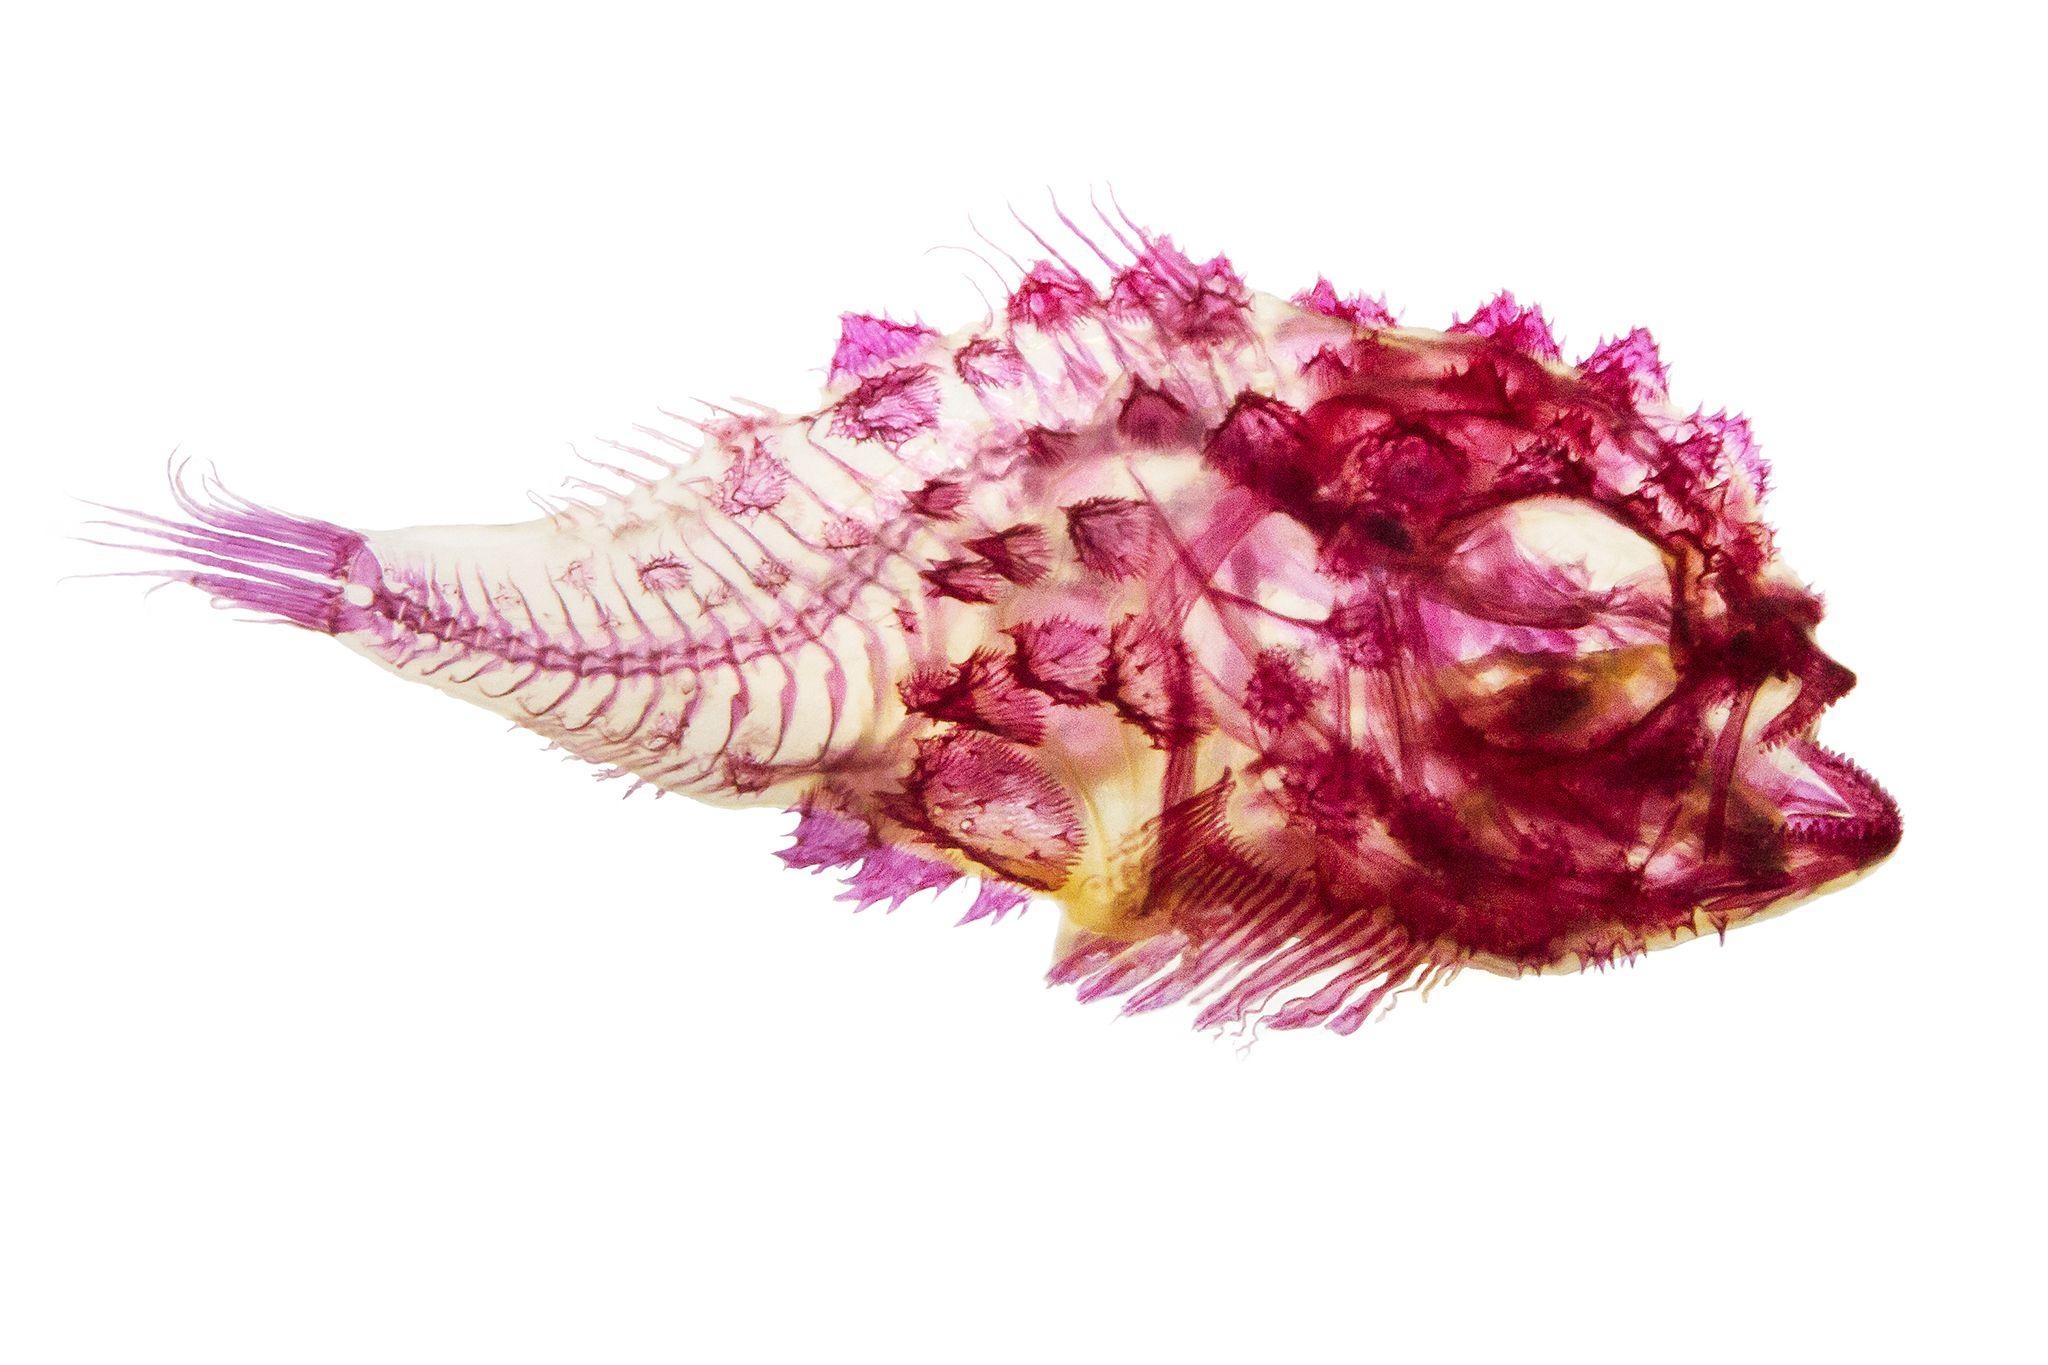 see-through-fish-02.jpg 2,048×1,365 pixels